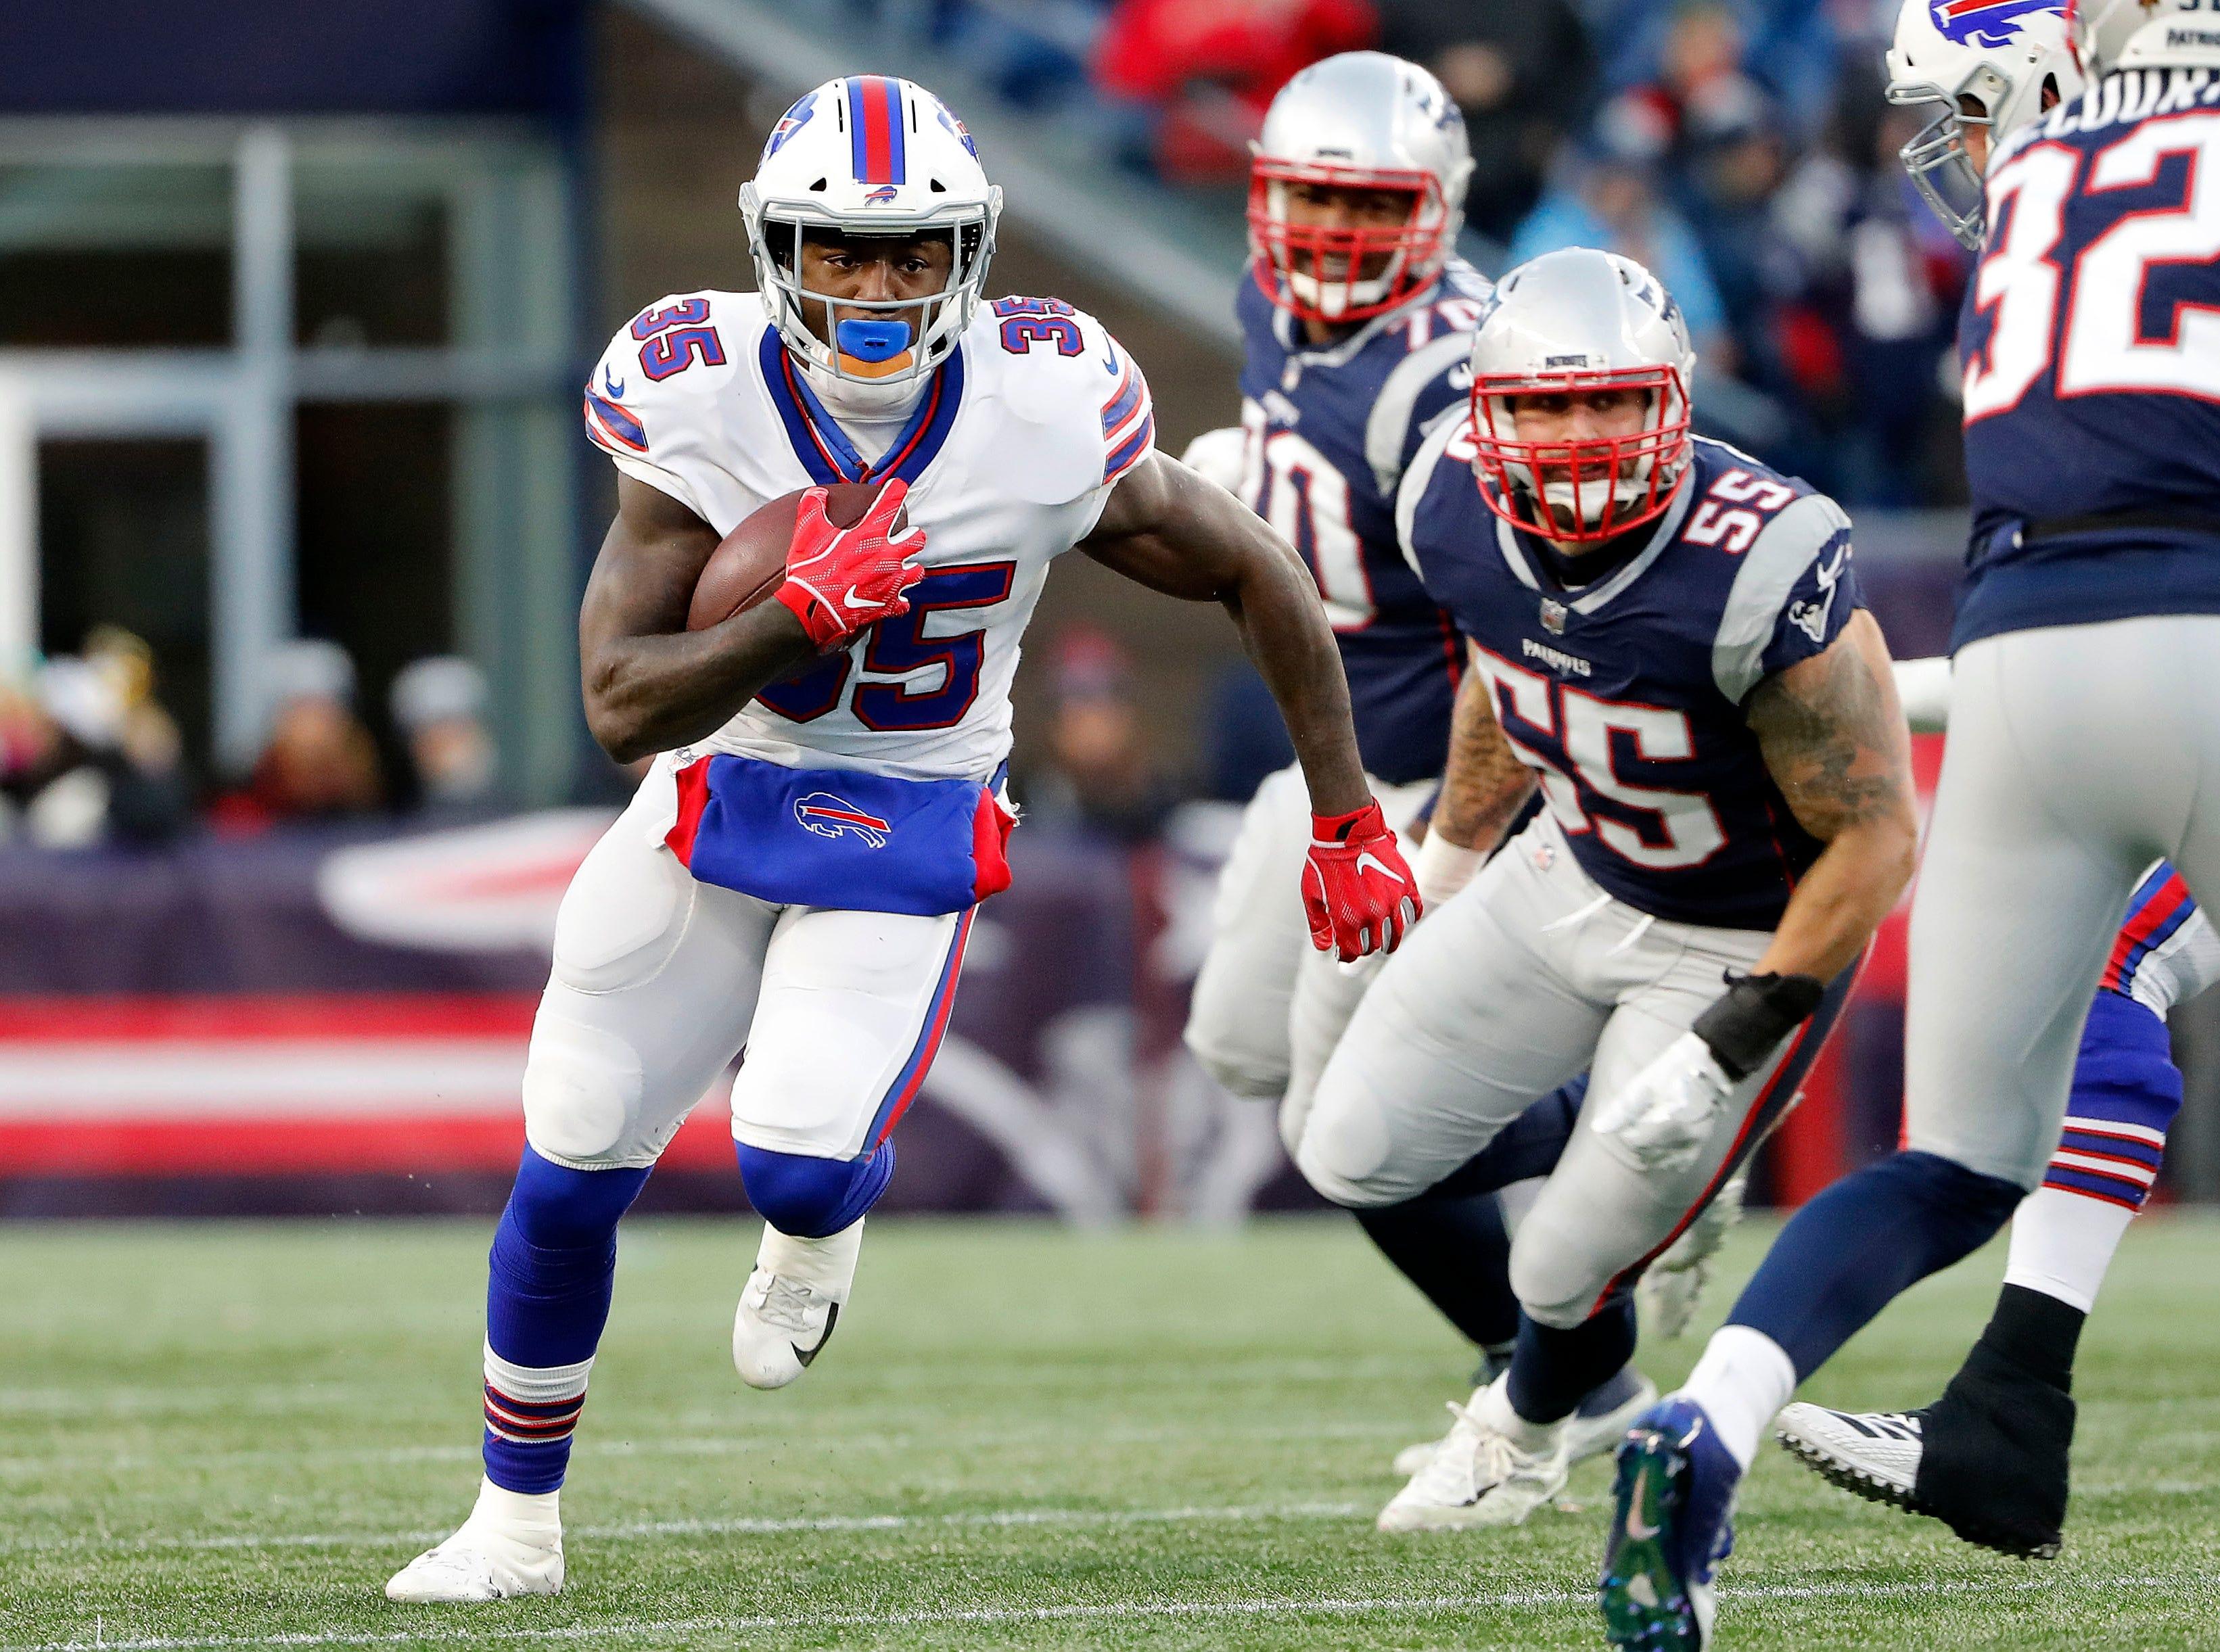 Buffalo Bills running back Keith Ford (35) runs past New England Patriots outside linebacker John Simon (55) during the second half at Gillette Stadium.